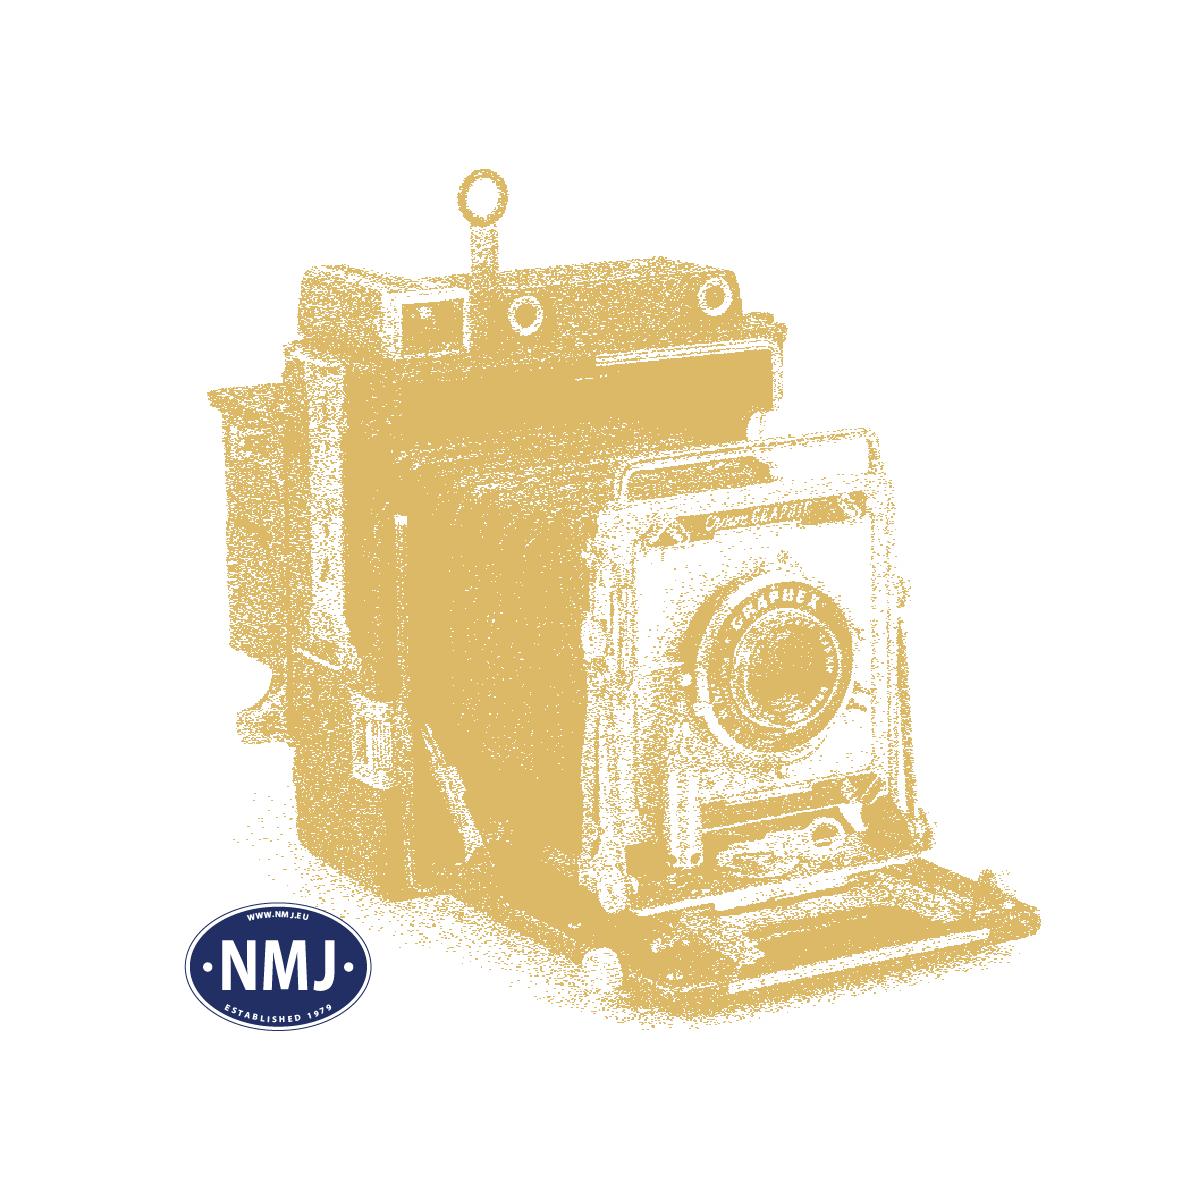 NMJT85.201AC - NMJ Topline CargoNet Di8.707, silber/gelb, AC Digital